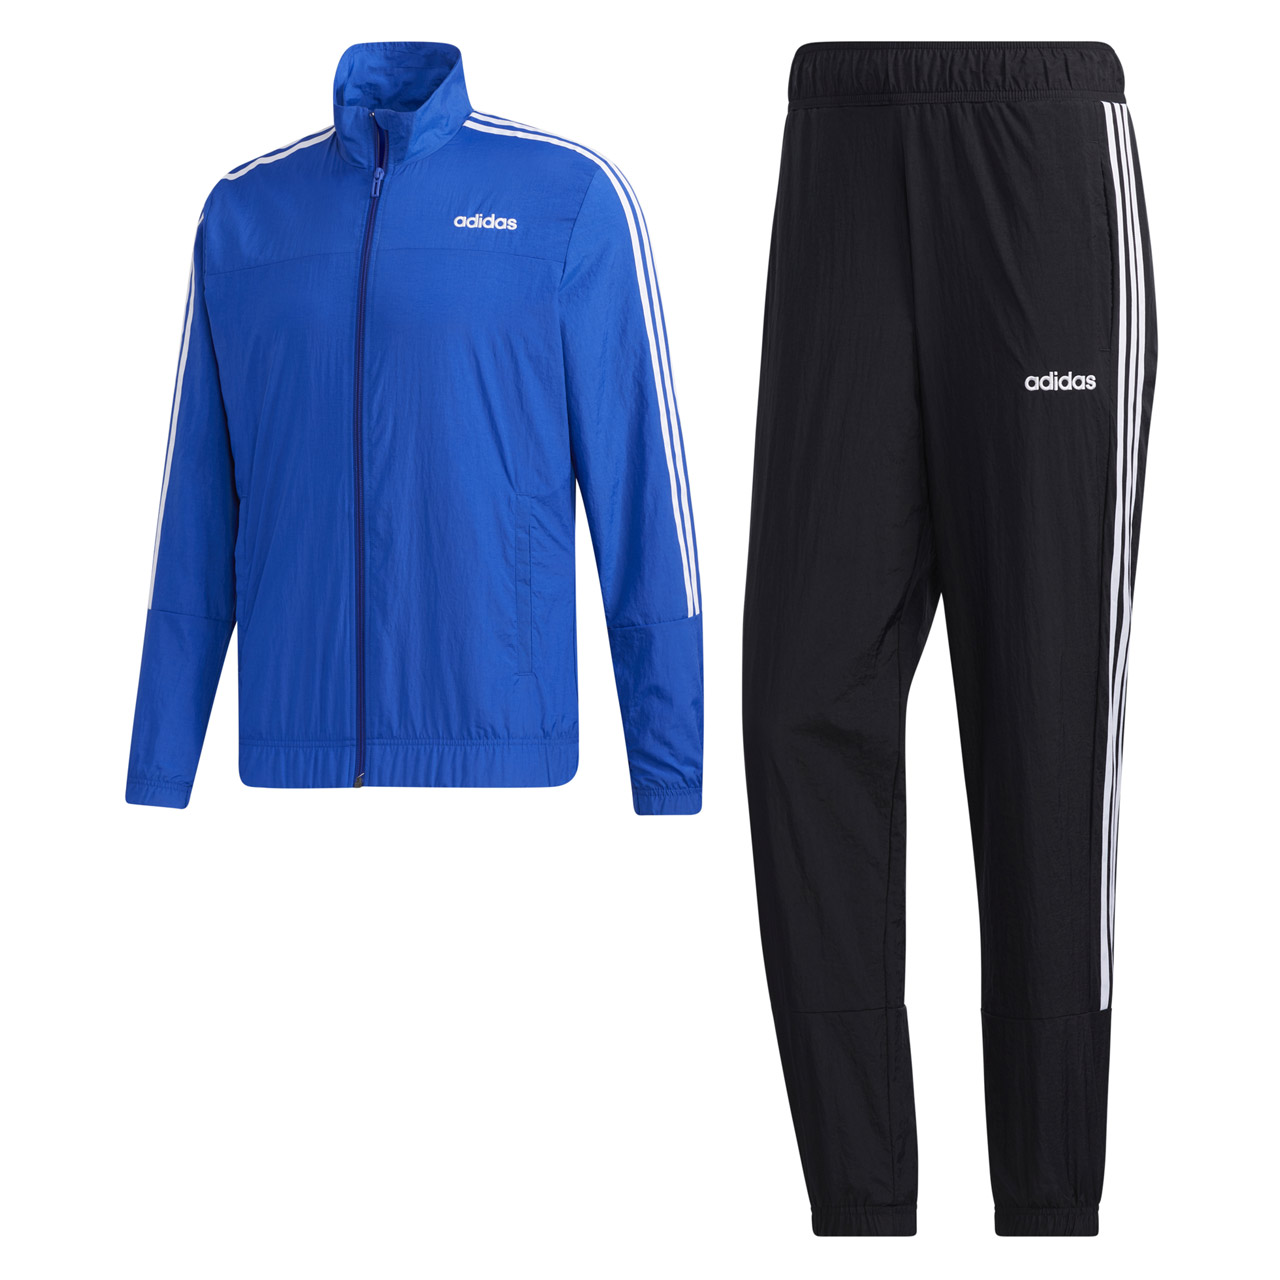 Herren Trainingsanzug Essentials Woven